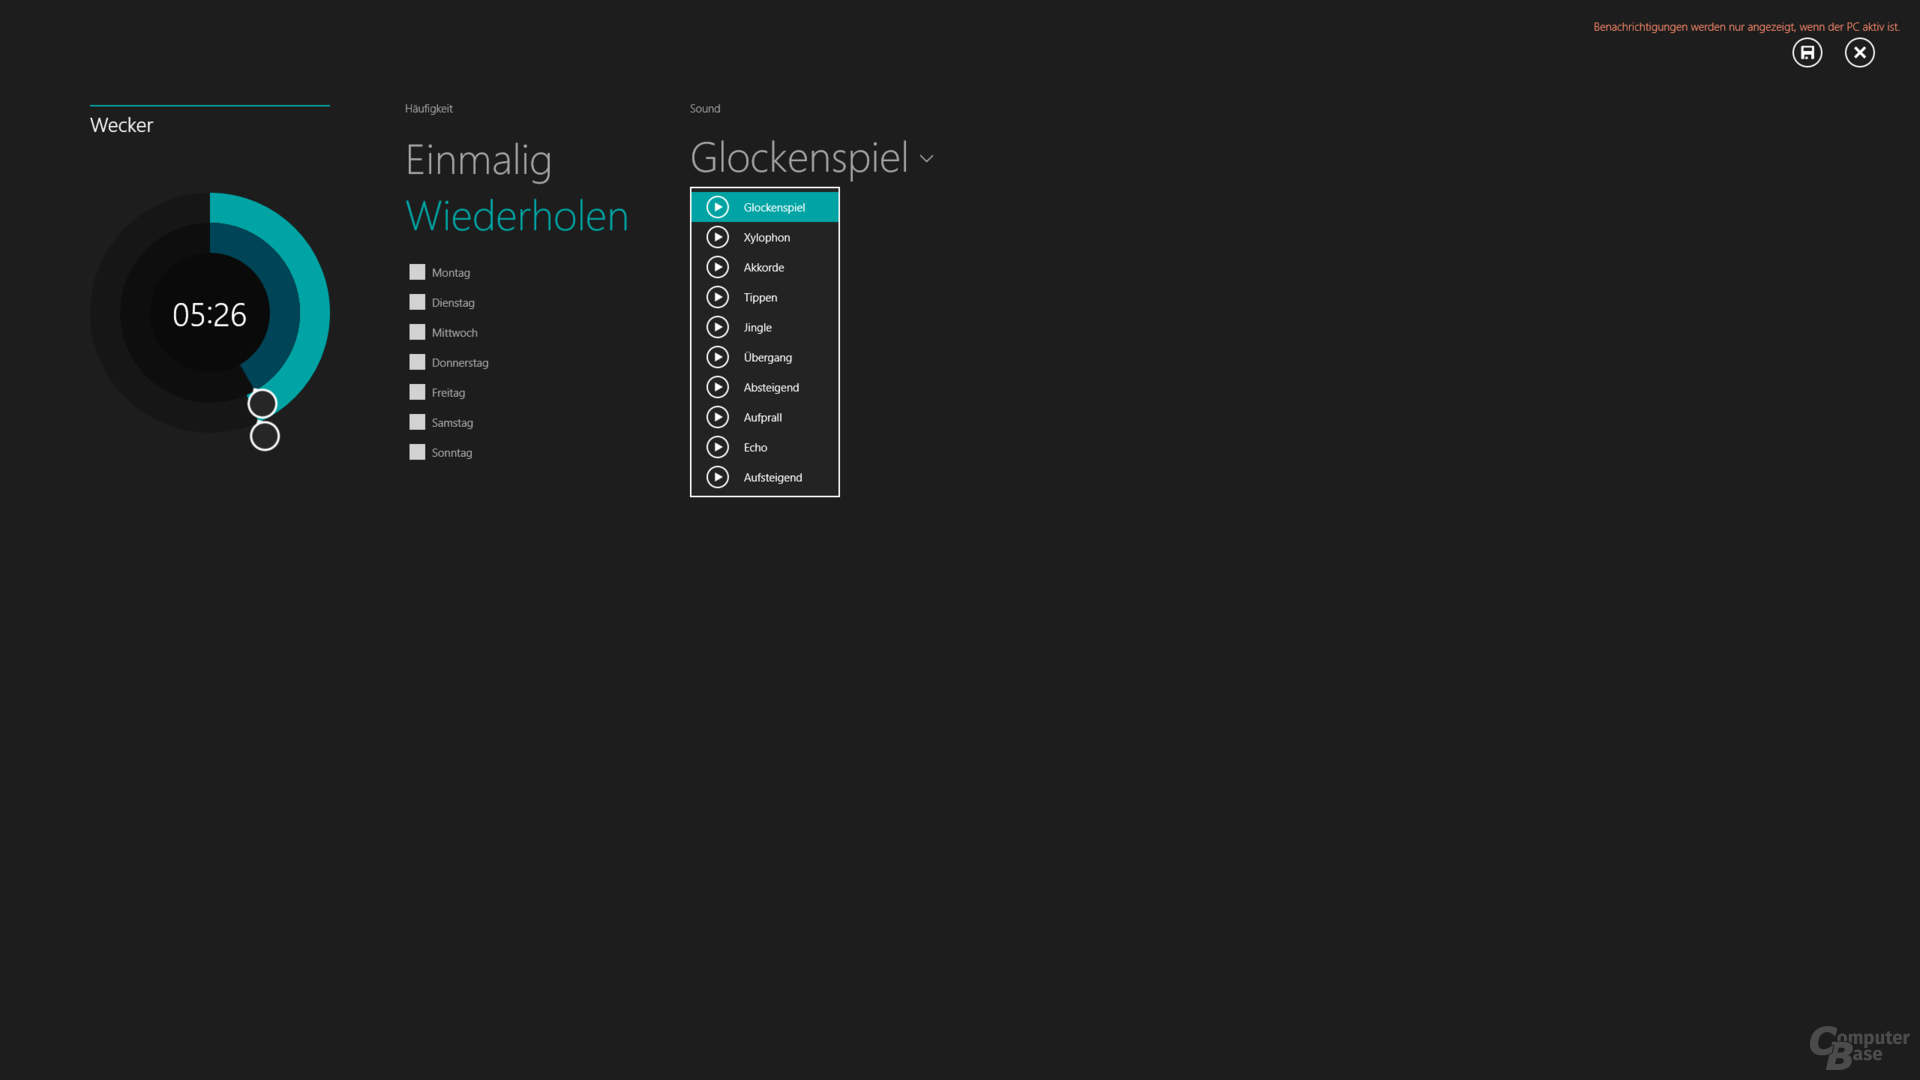 Wecker-App